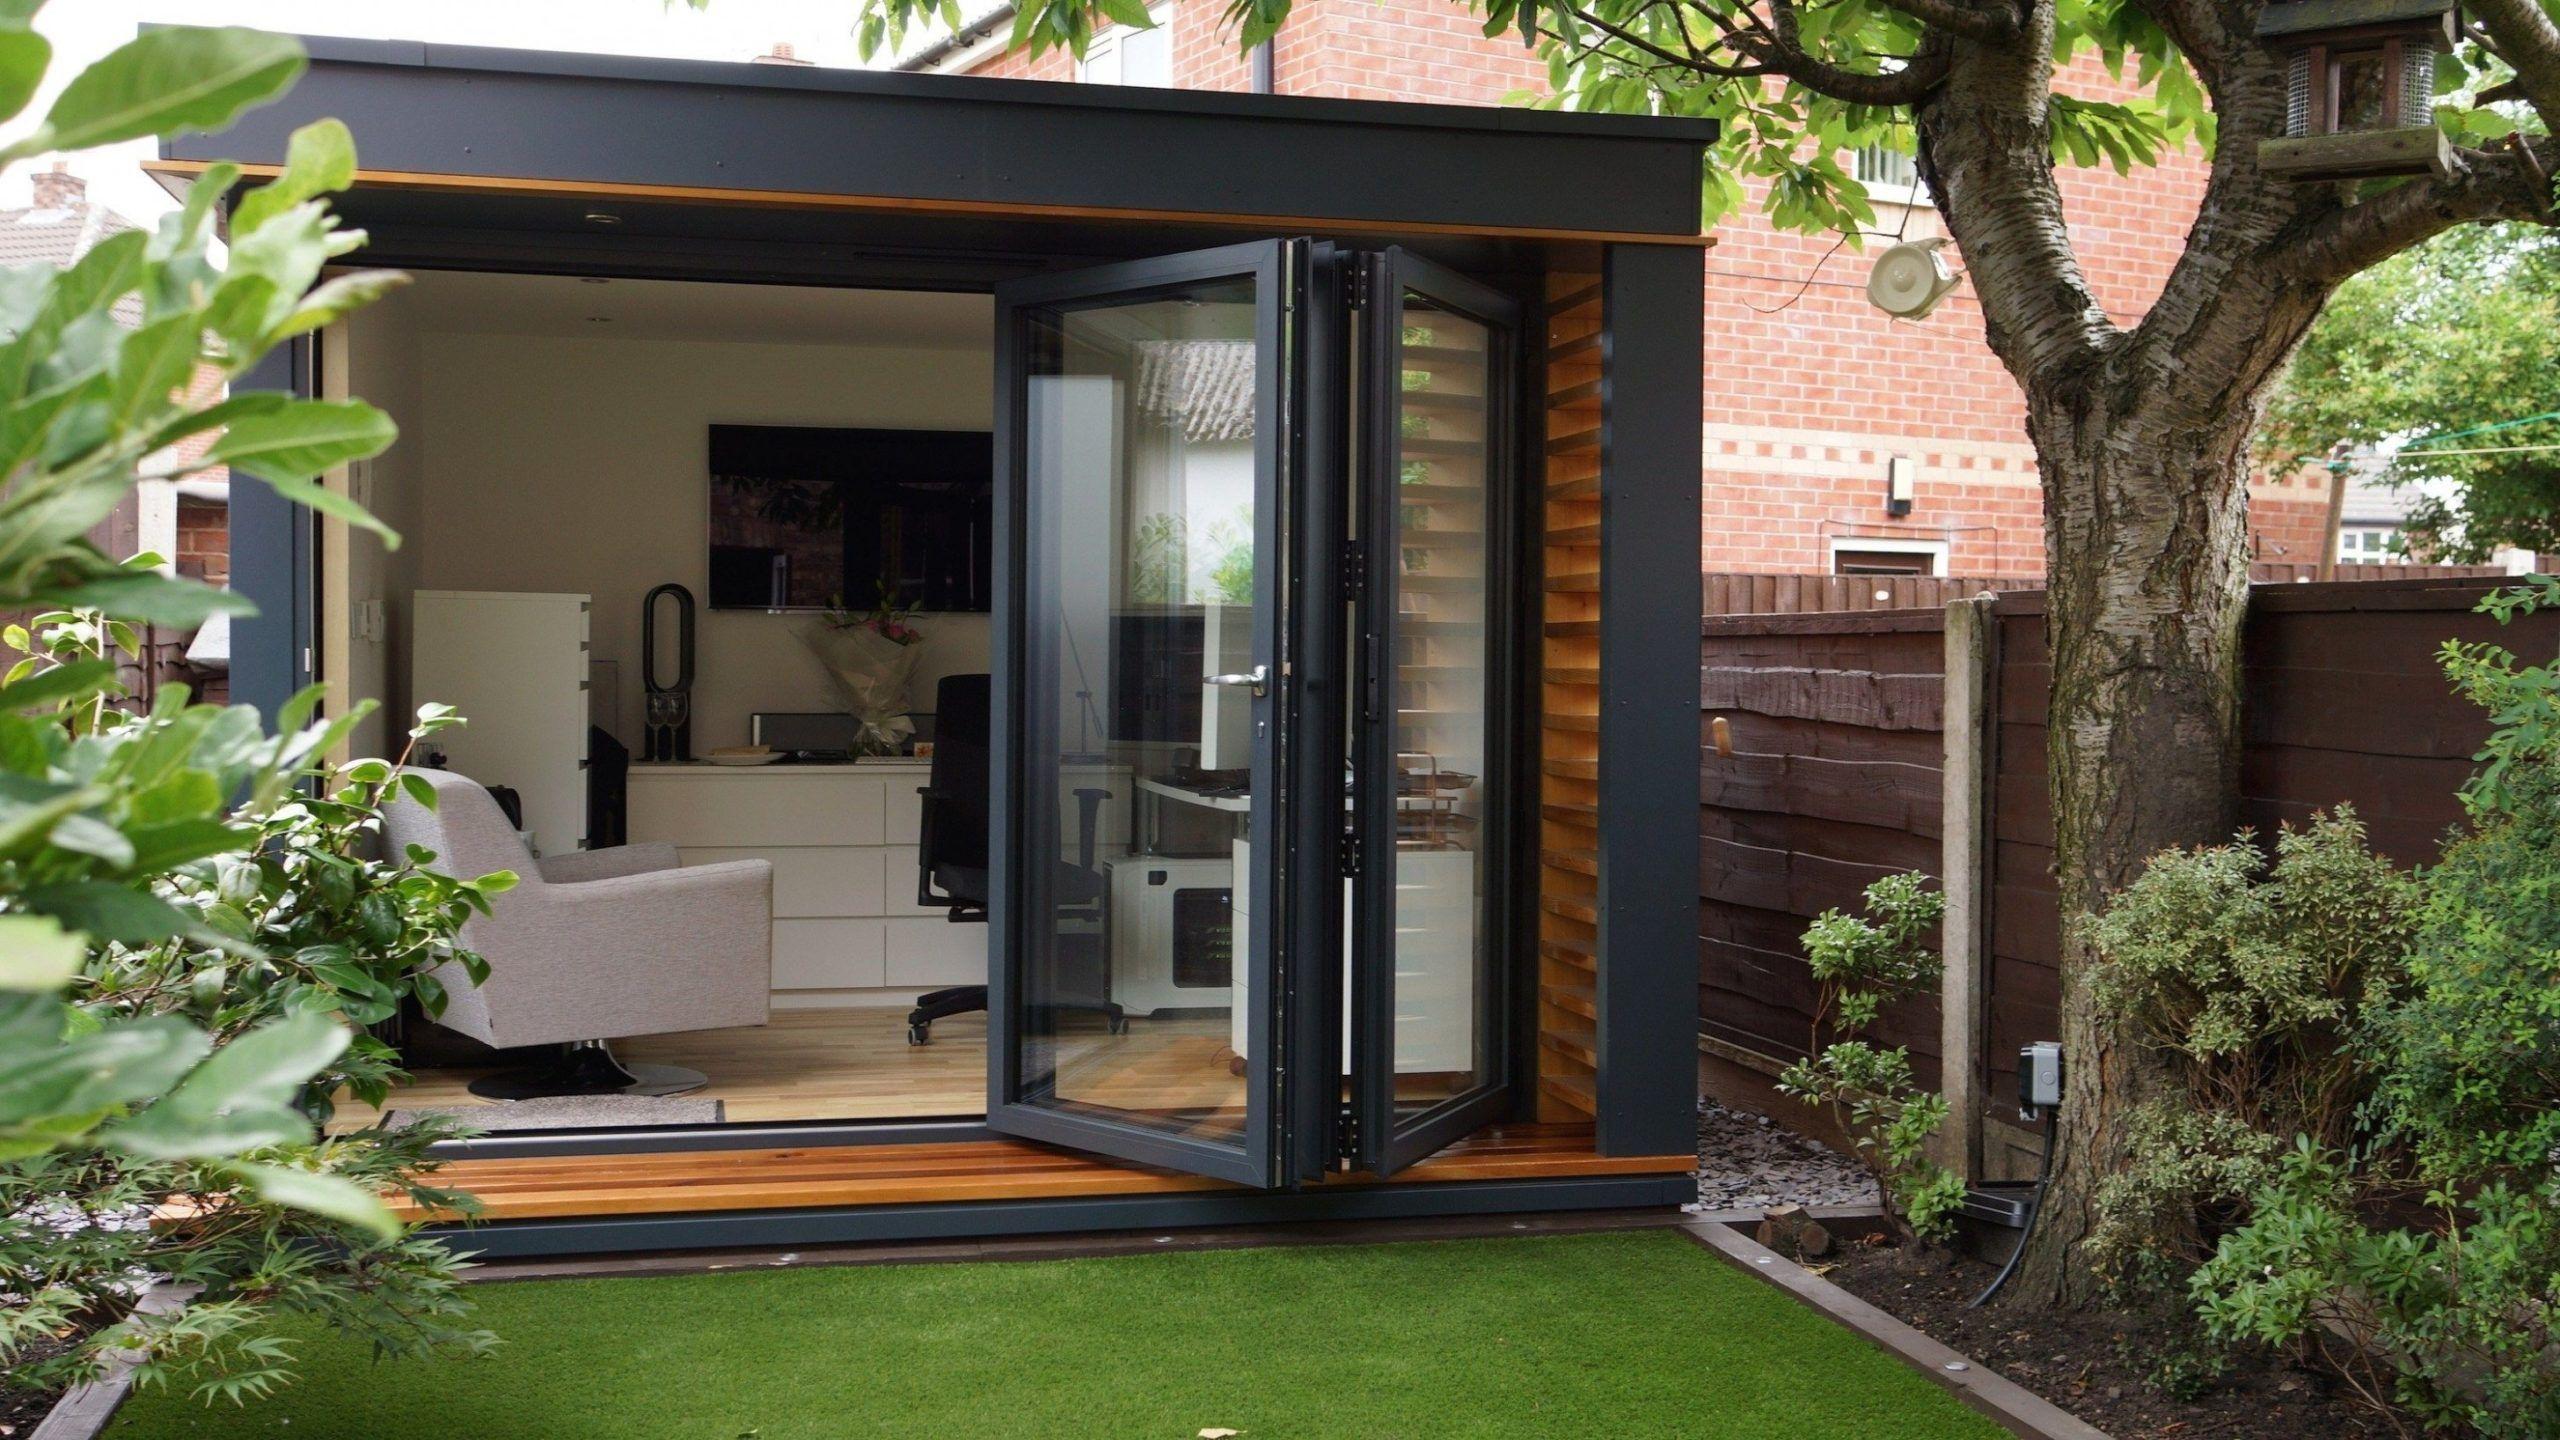 Garden Office Design Ideas#design #garden #ideas #office in 9